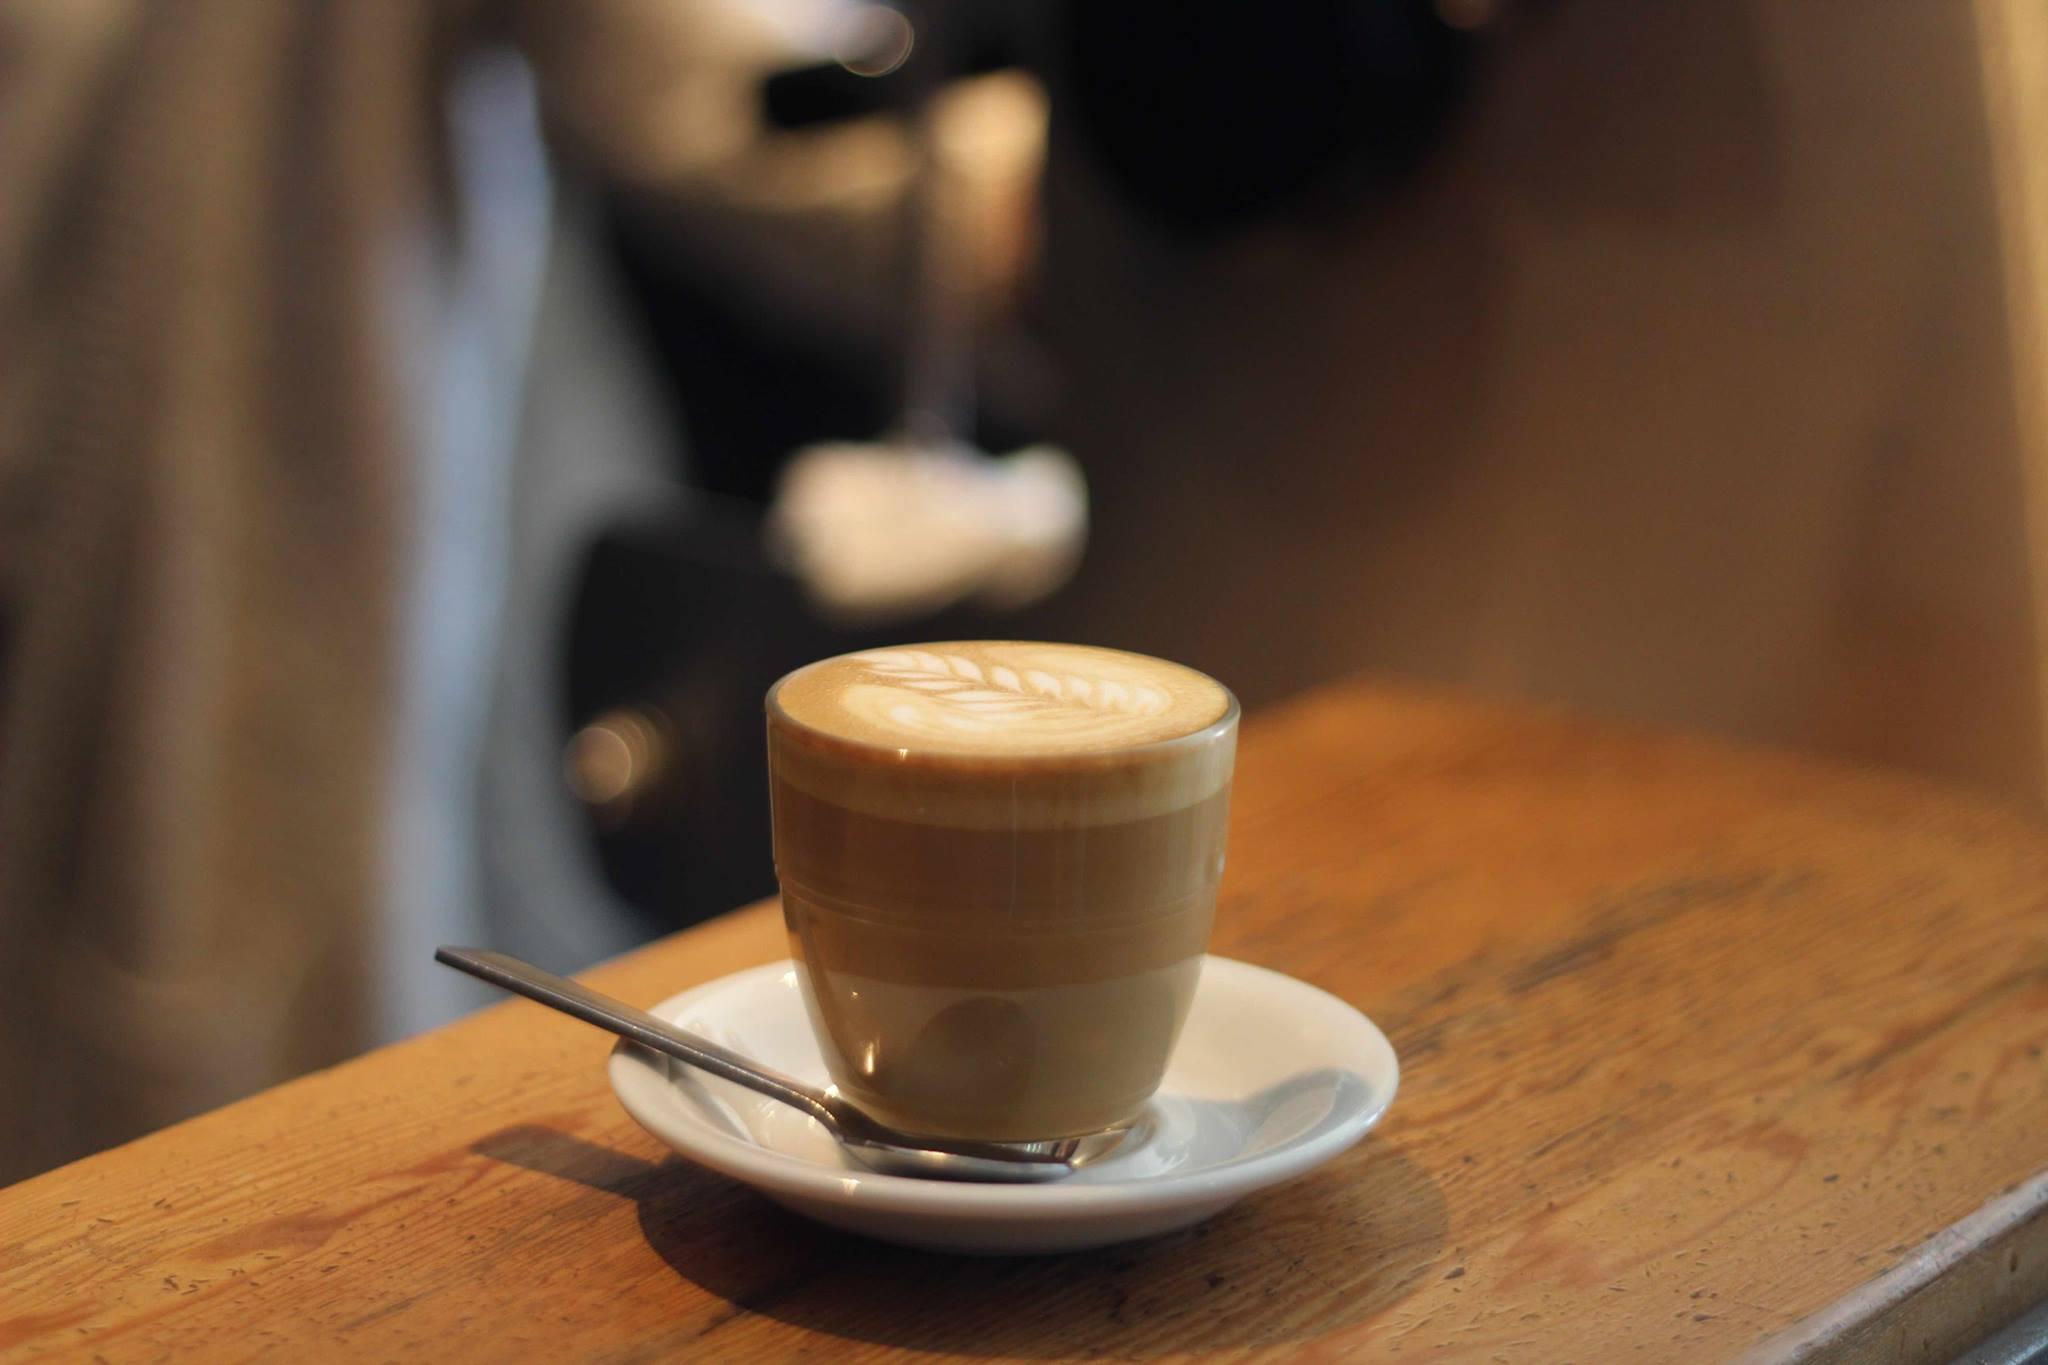 Saskatoon Coffee